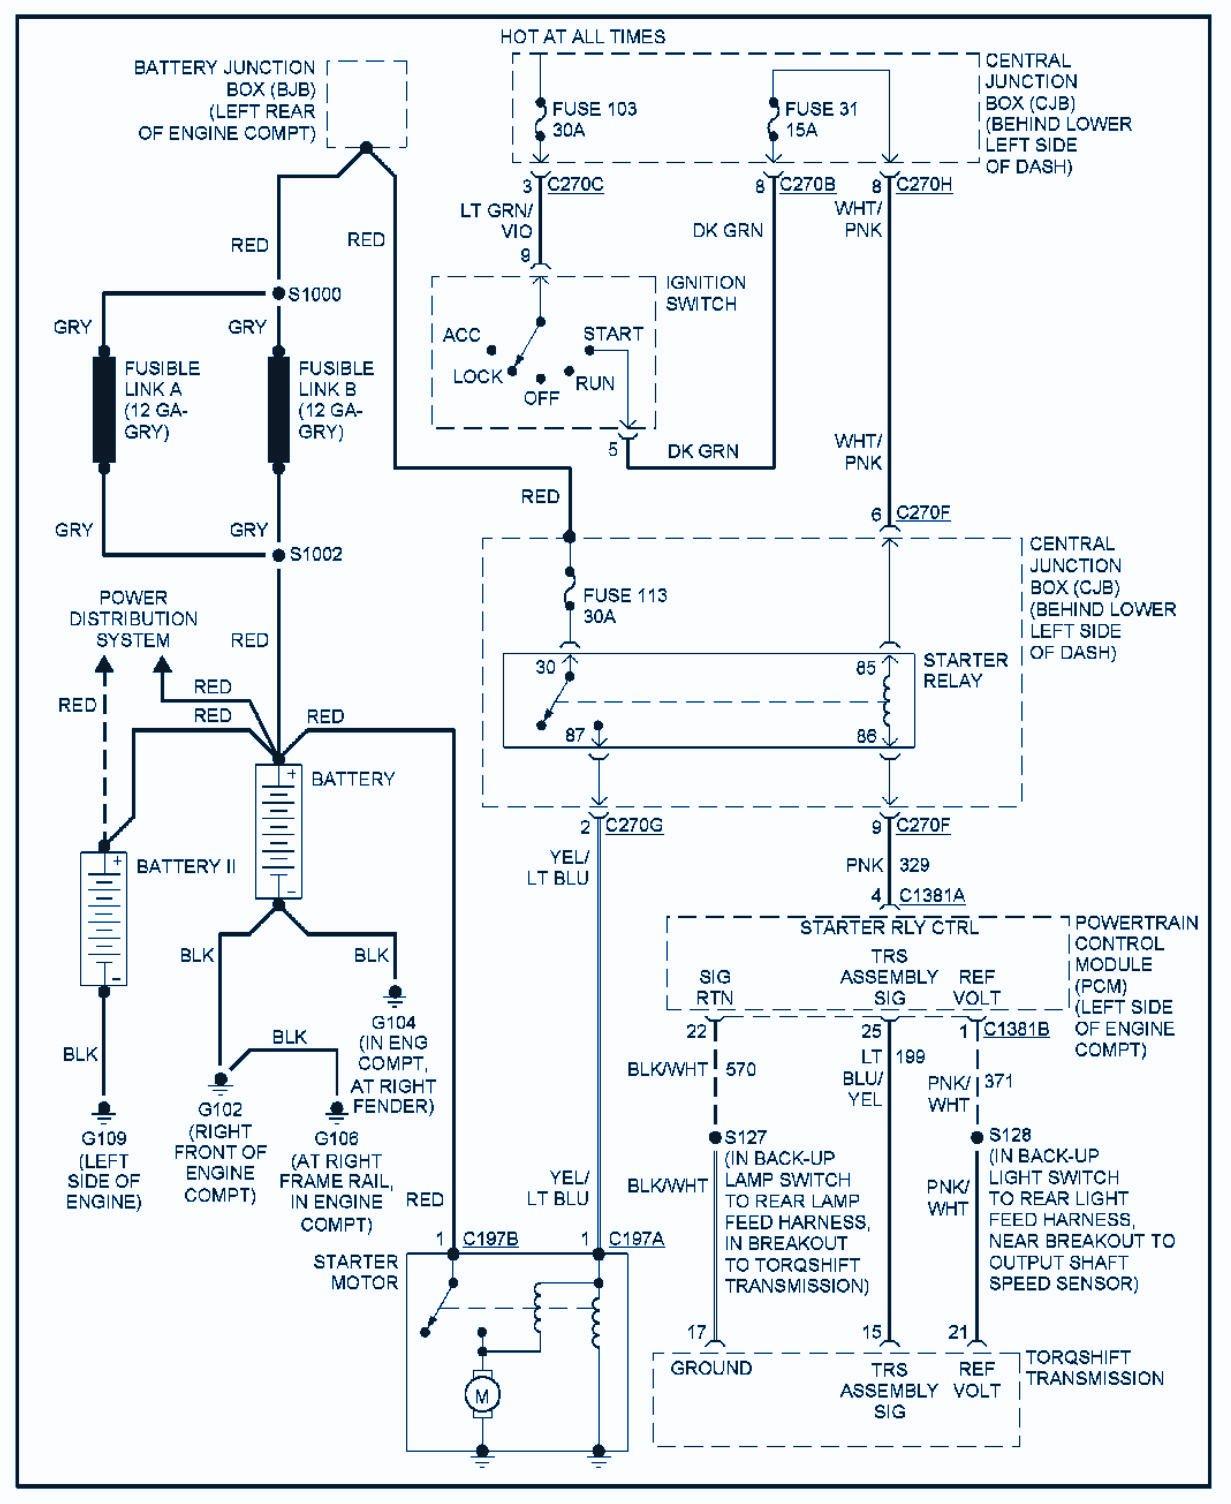 Sm50 Wiring Diagram Circuit Symbols Generic Auto Search For Diagrams U2022 Rh Idijournal Com Motorola Narrow Band